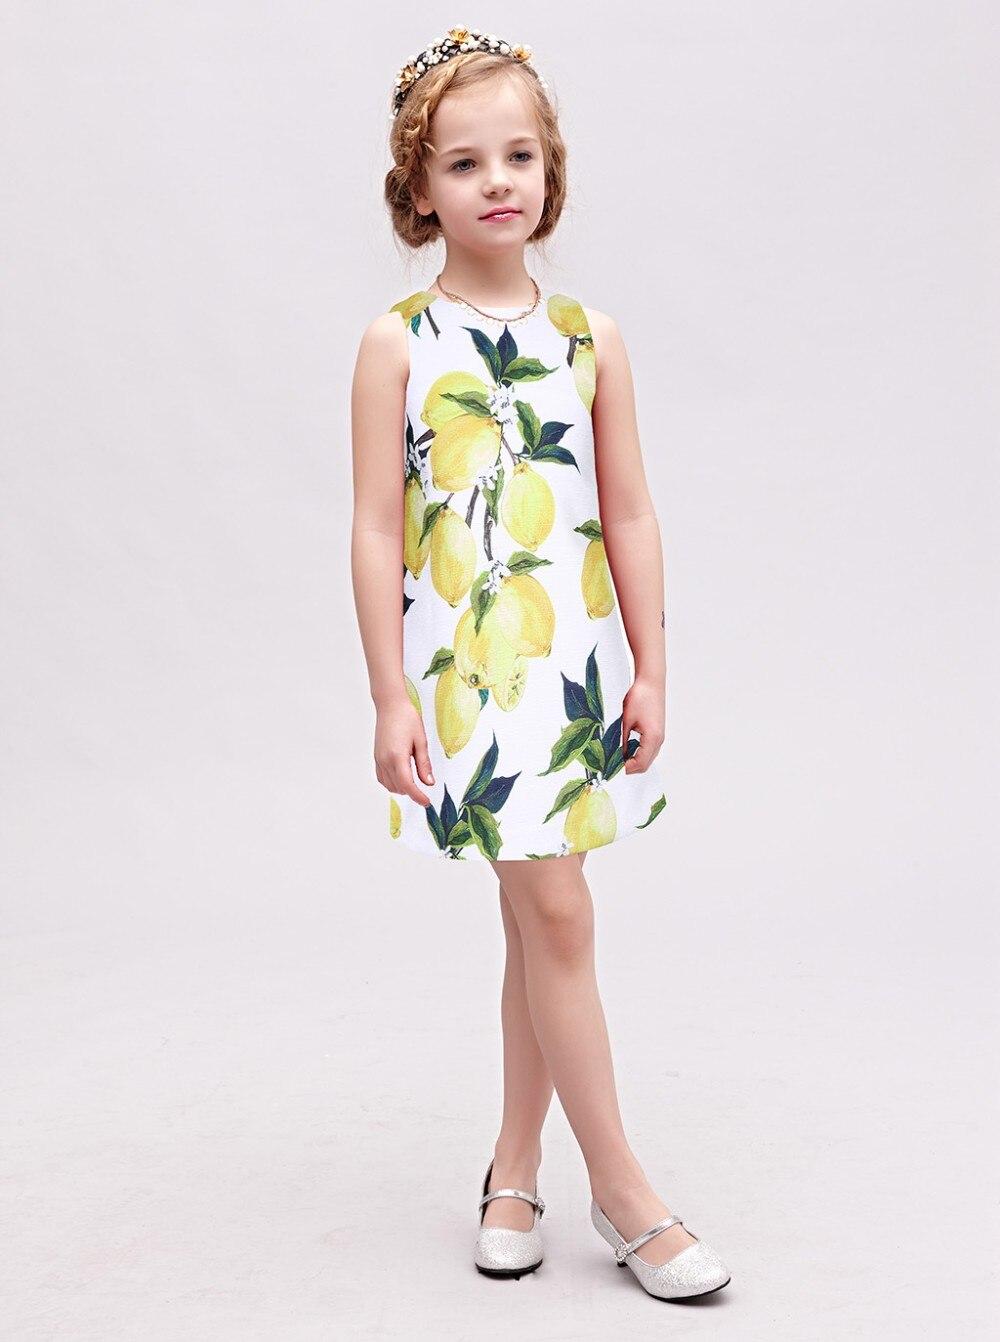 WL MONSOON Baby Girl Dress Brand Girls Summer Dress Kids Costume With Lemon Floral Print Wedding Dress Girl Vetement Fille 3-12Y<br><br>Aliexpress